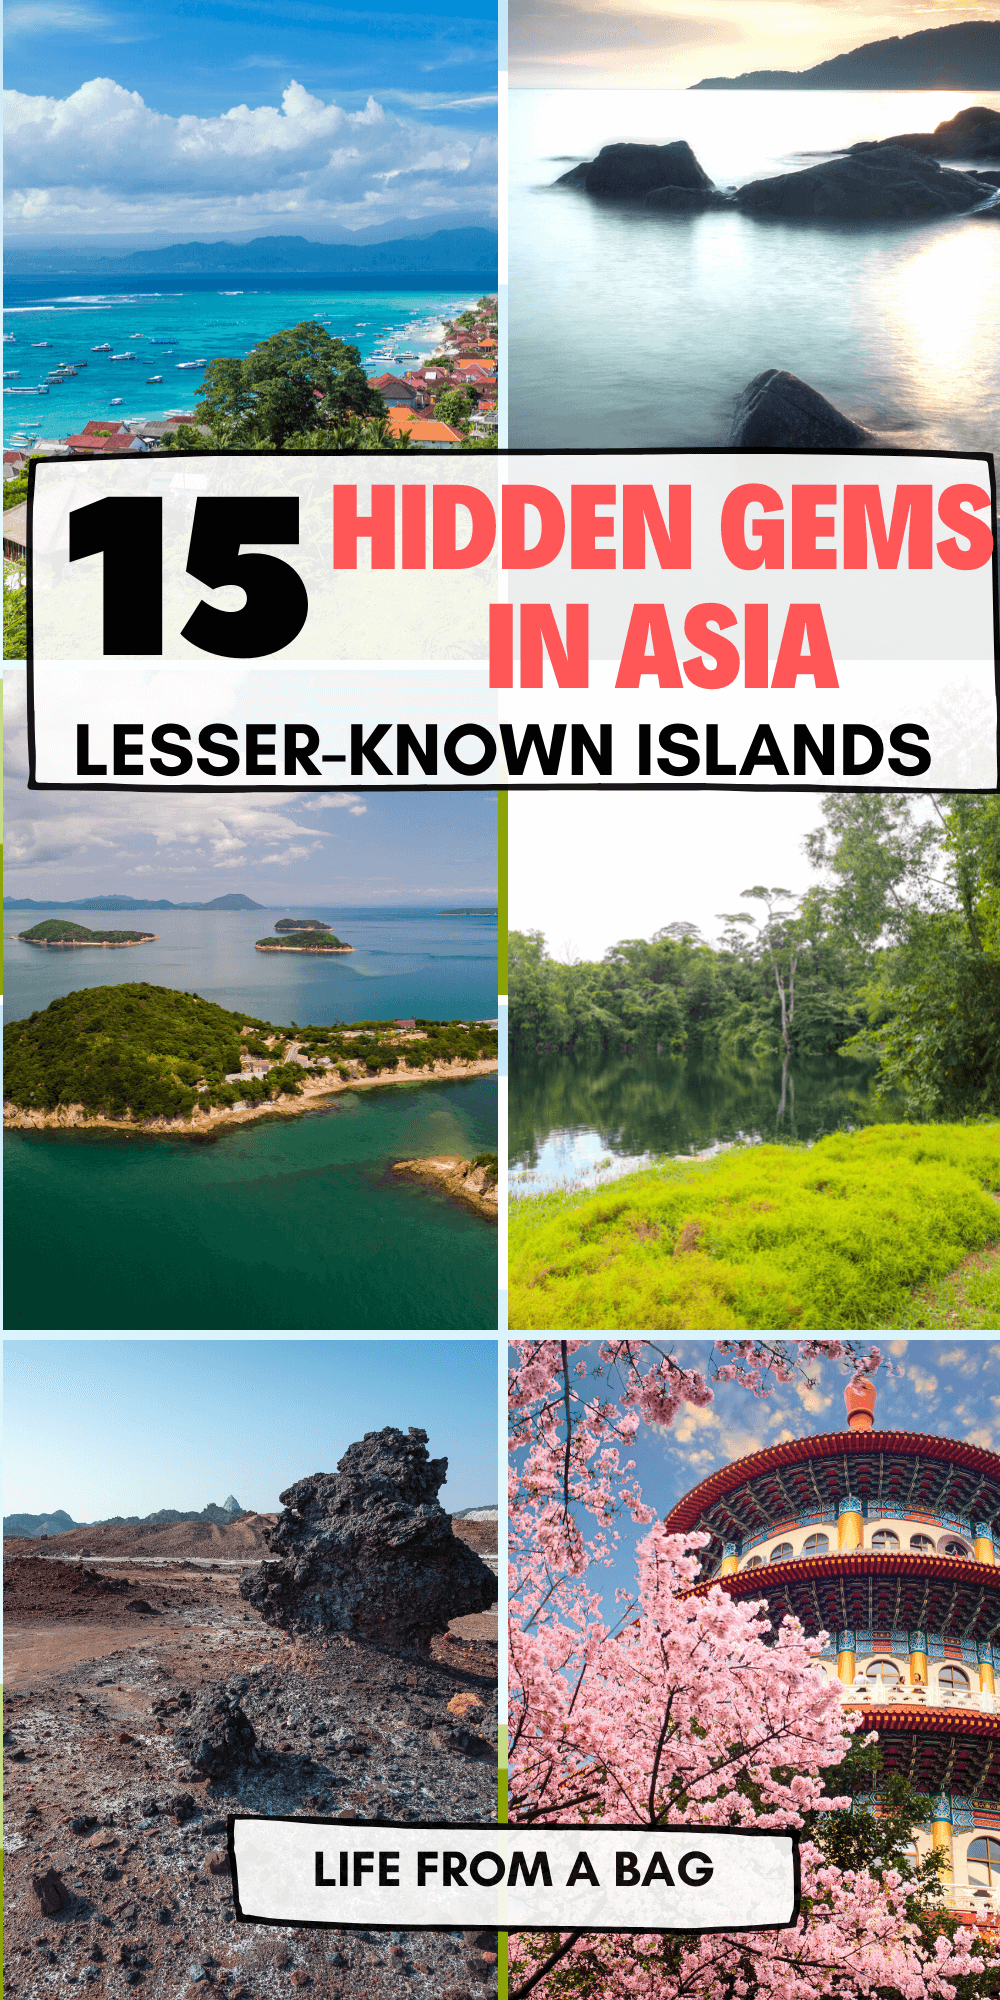 Hidden Gems in Asia